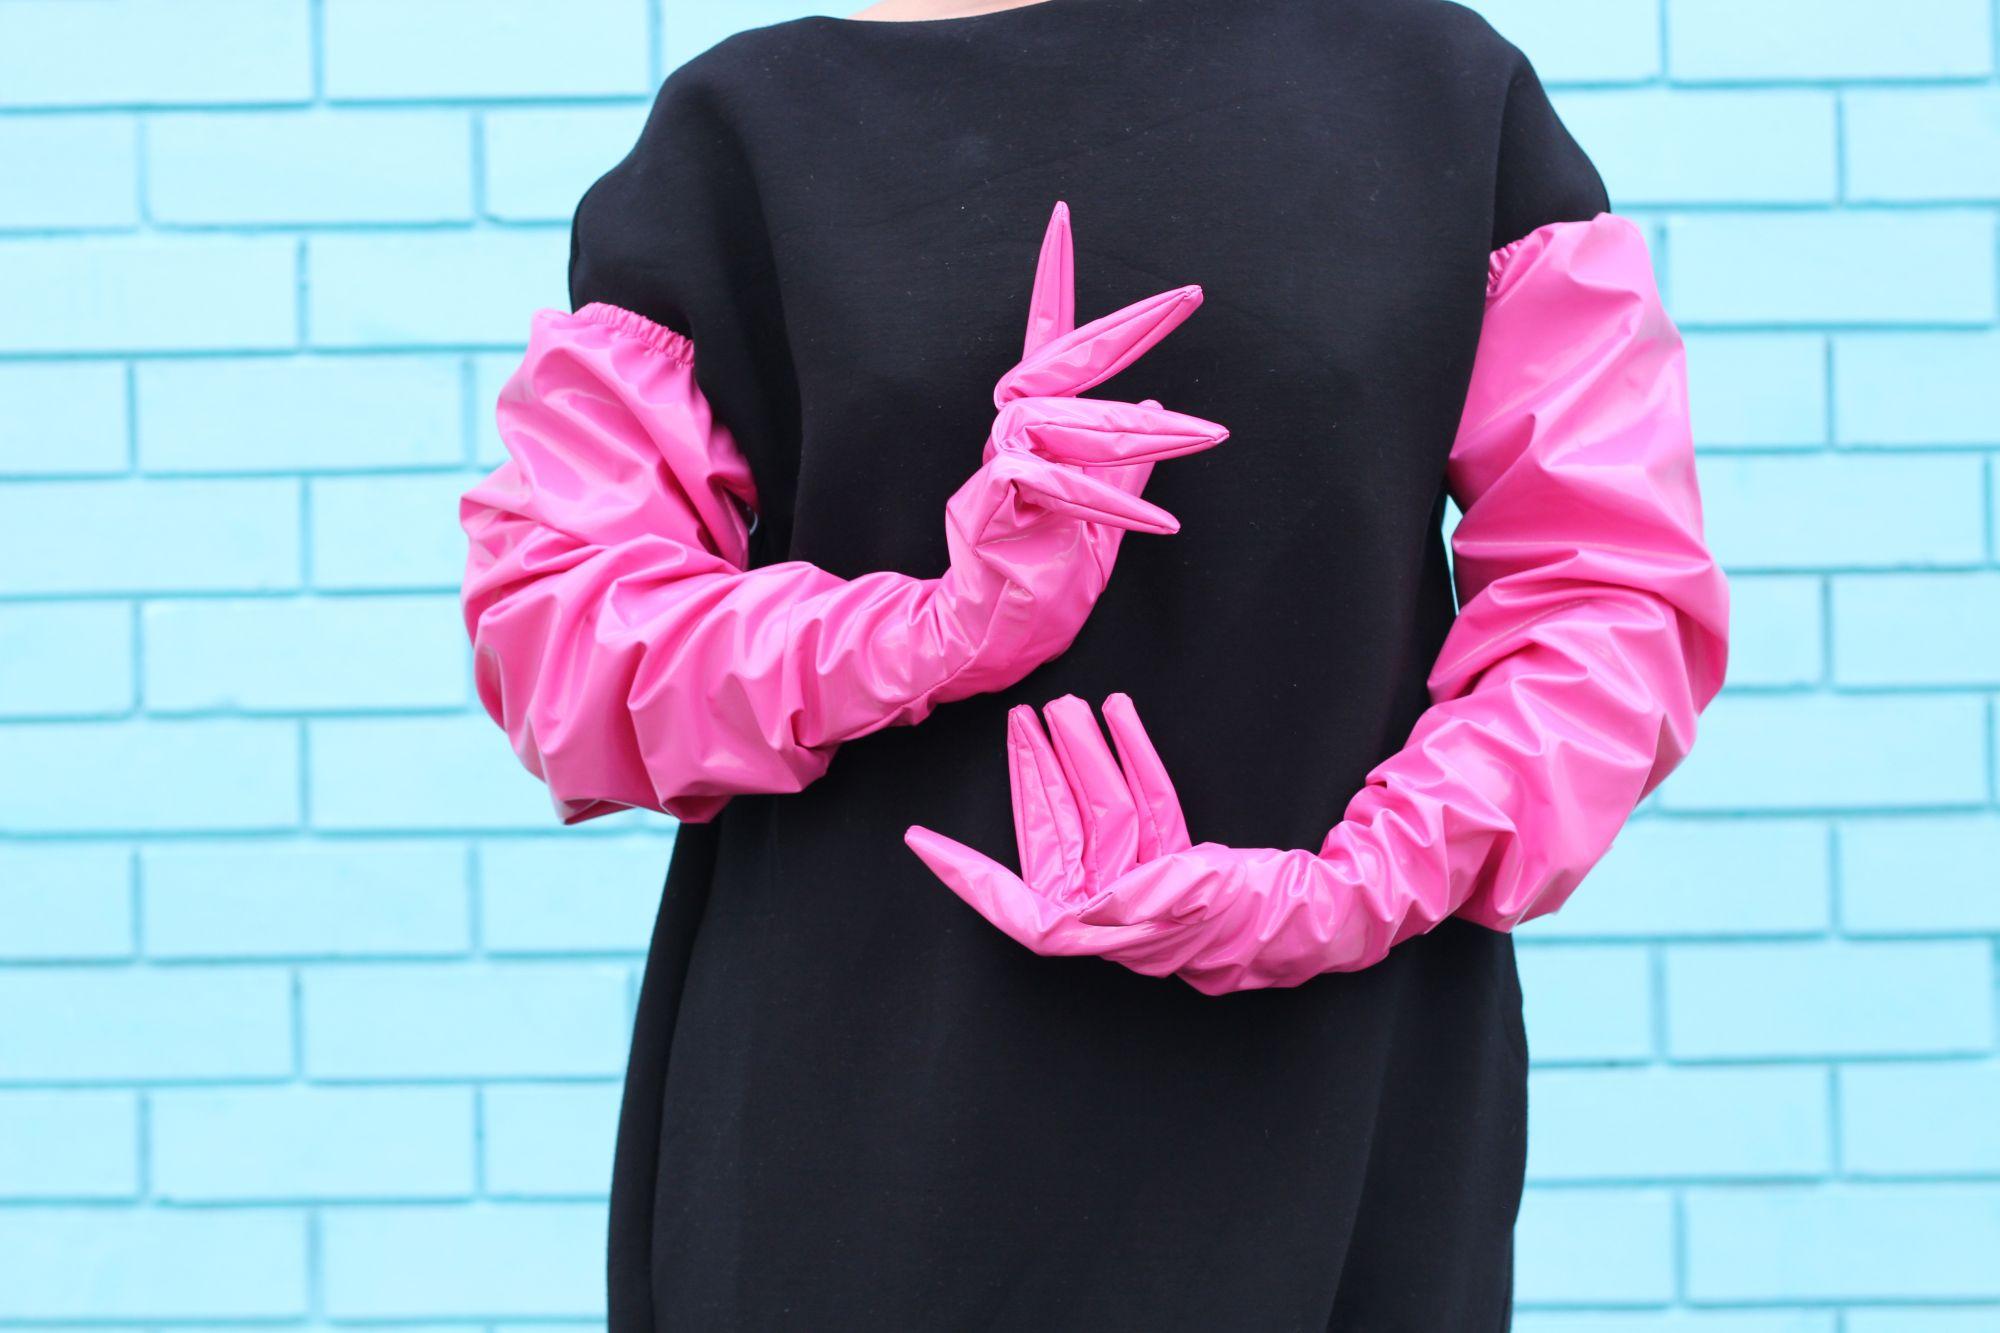 Untitled (Gloves)